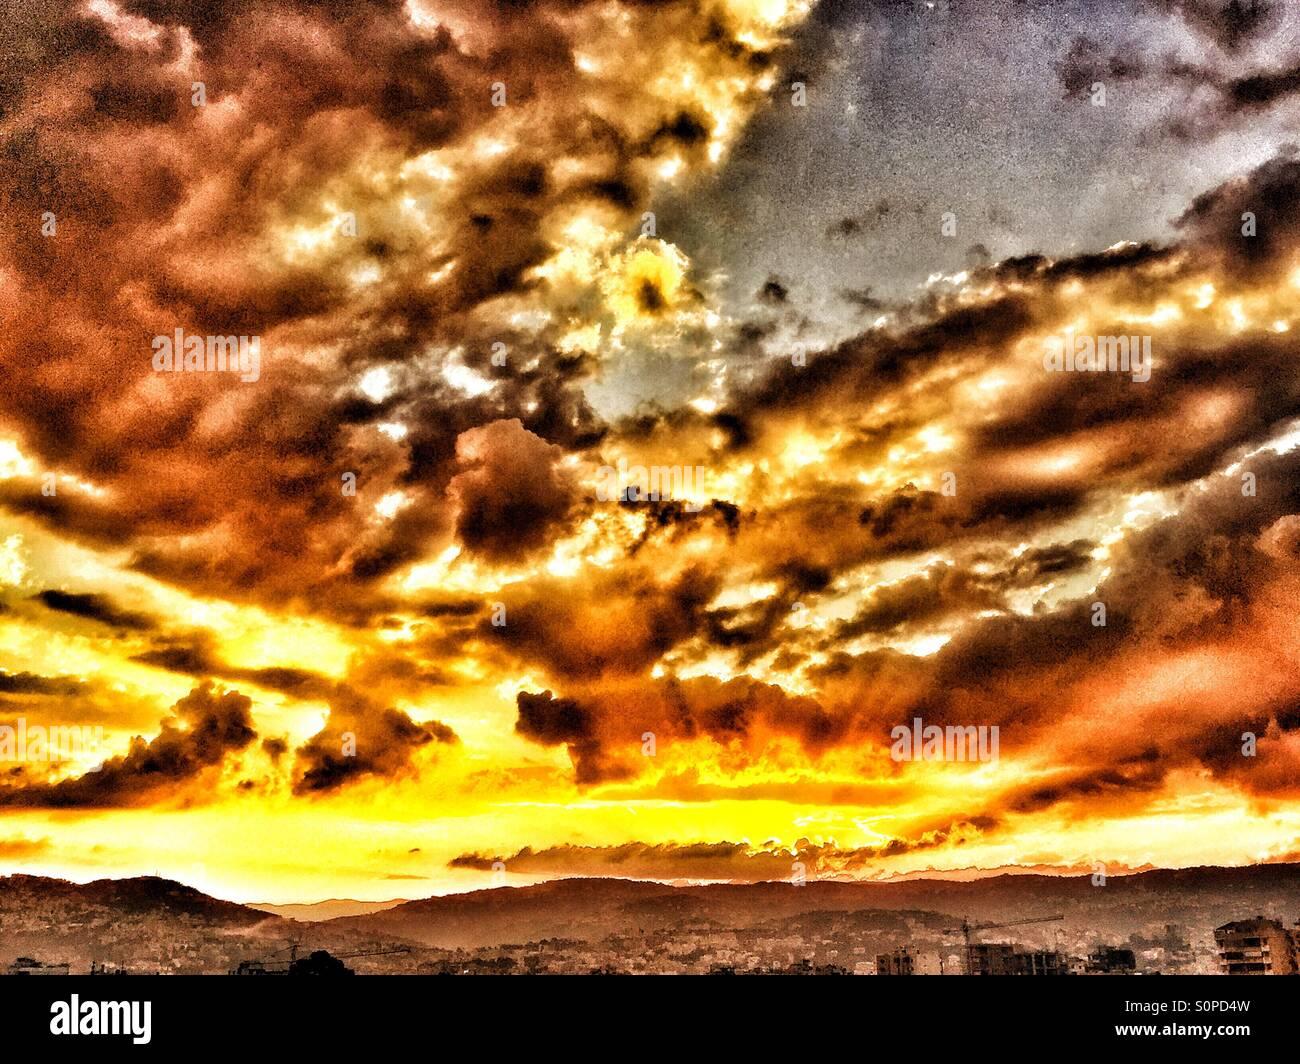 Sun rise,mont lebanon,sun light,clouds,Husseinelsaneh - Stock Image